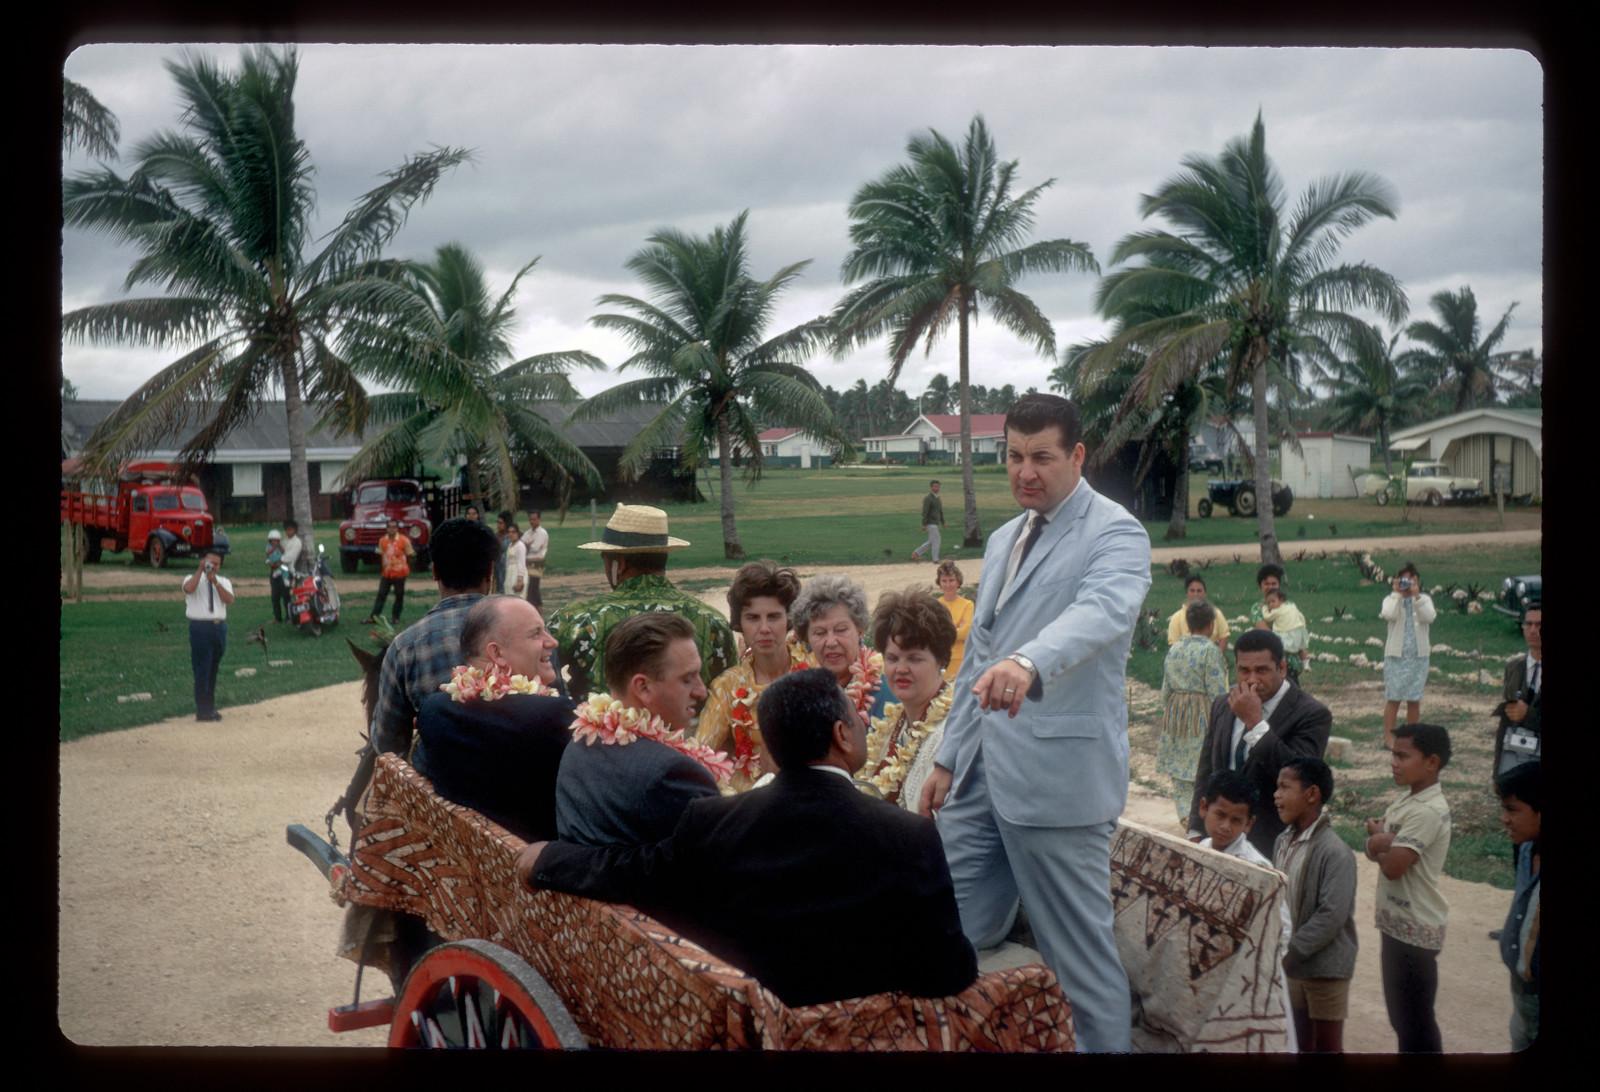 Elder John Groberg, right, of the Tonga Mission, joins Elder Thomas S. Monson, Elder Howard W. Hunter and their wives for a wagon ride in September 1968 in Tonga.